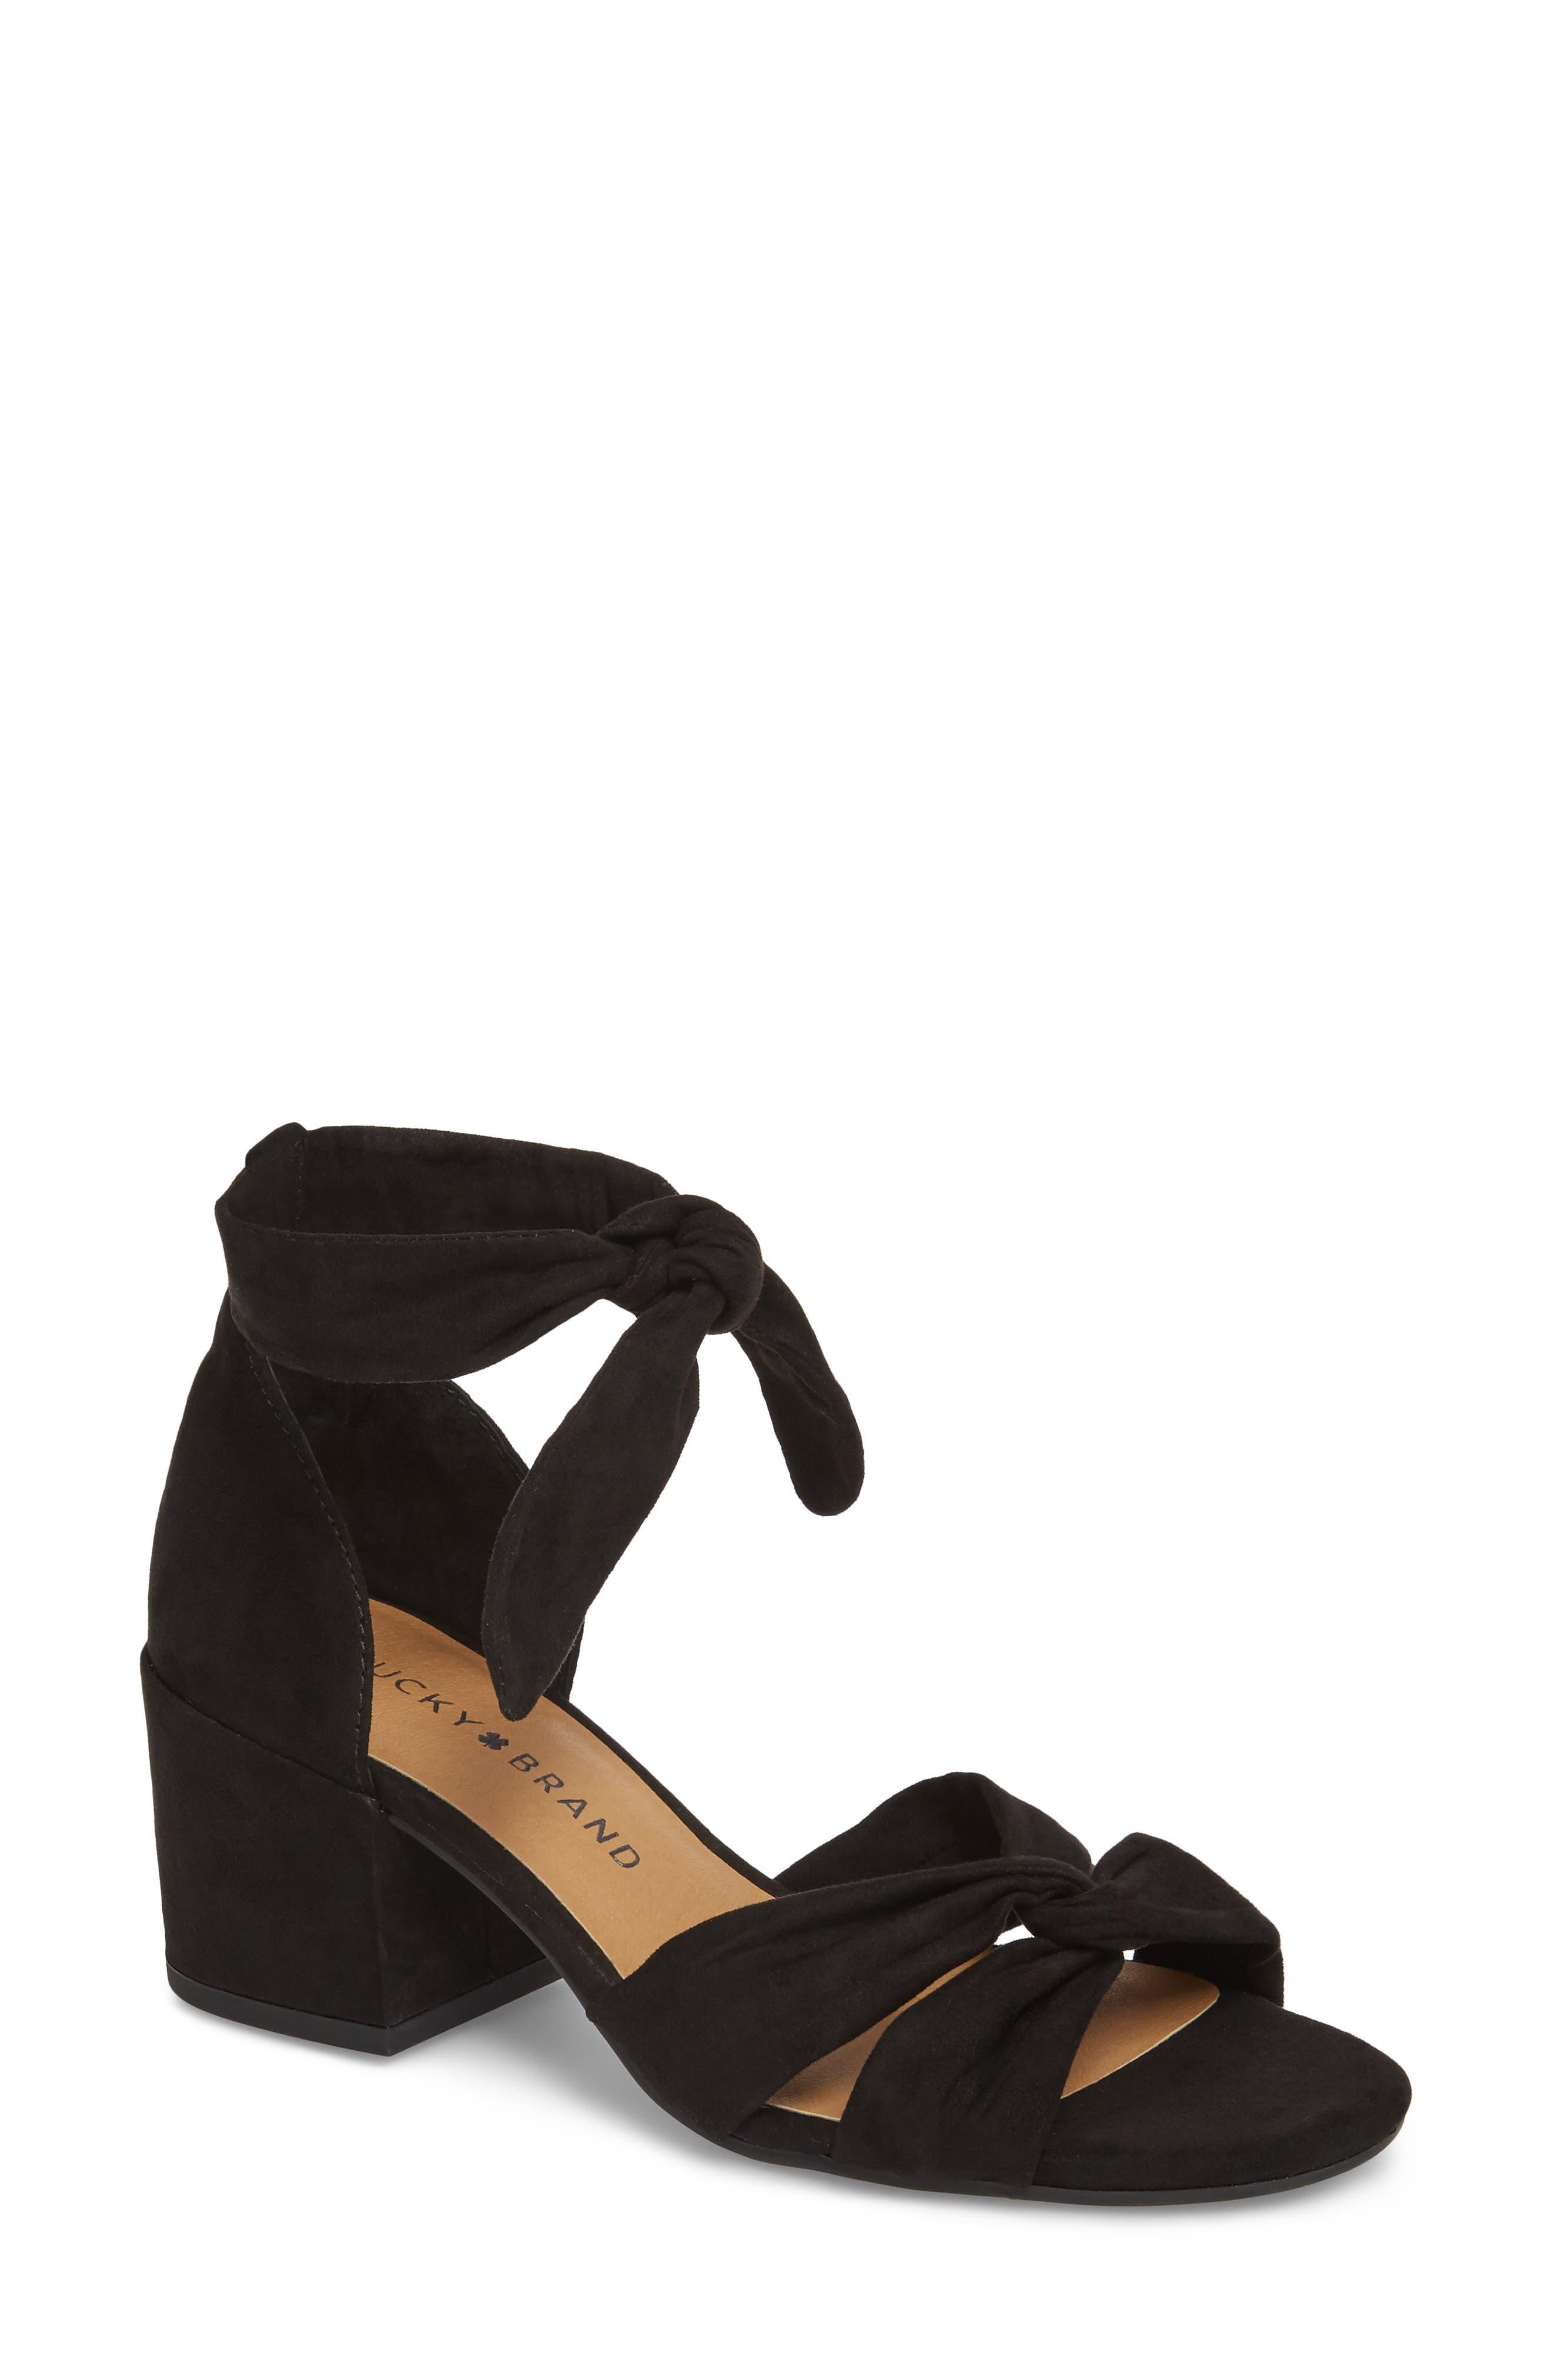 Xaylah Ankle Strap Sandal,                             Main thumbnail 1, color,